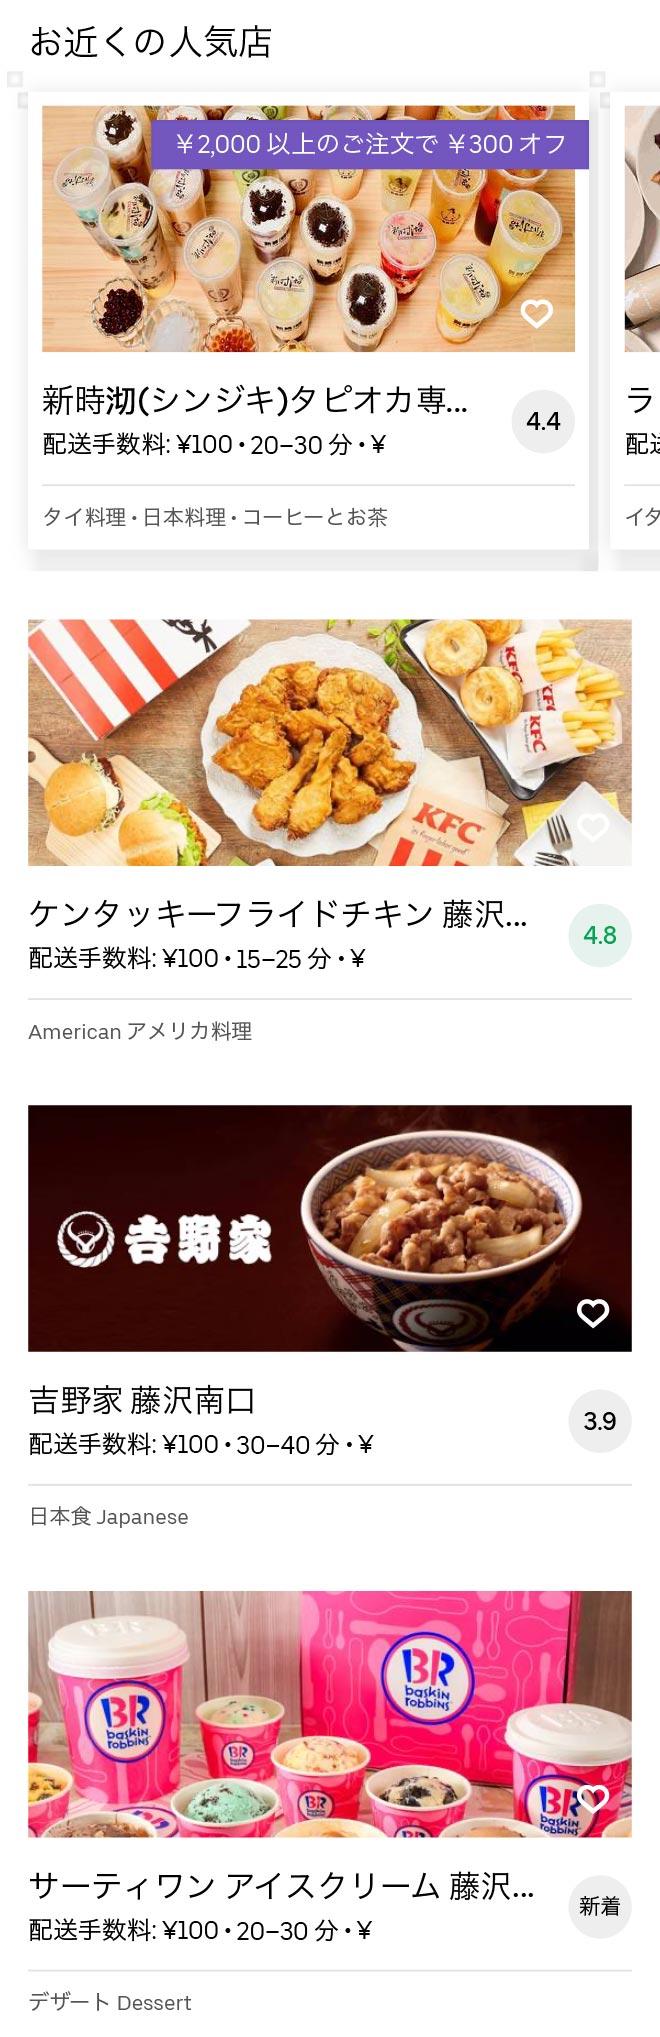 Fujisawa menu 2008 02